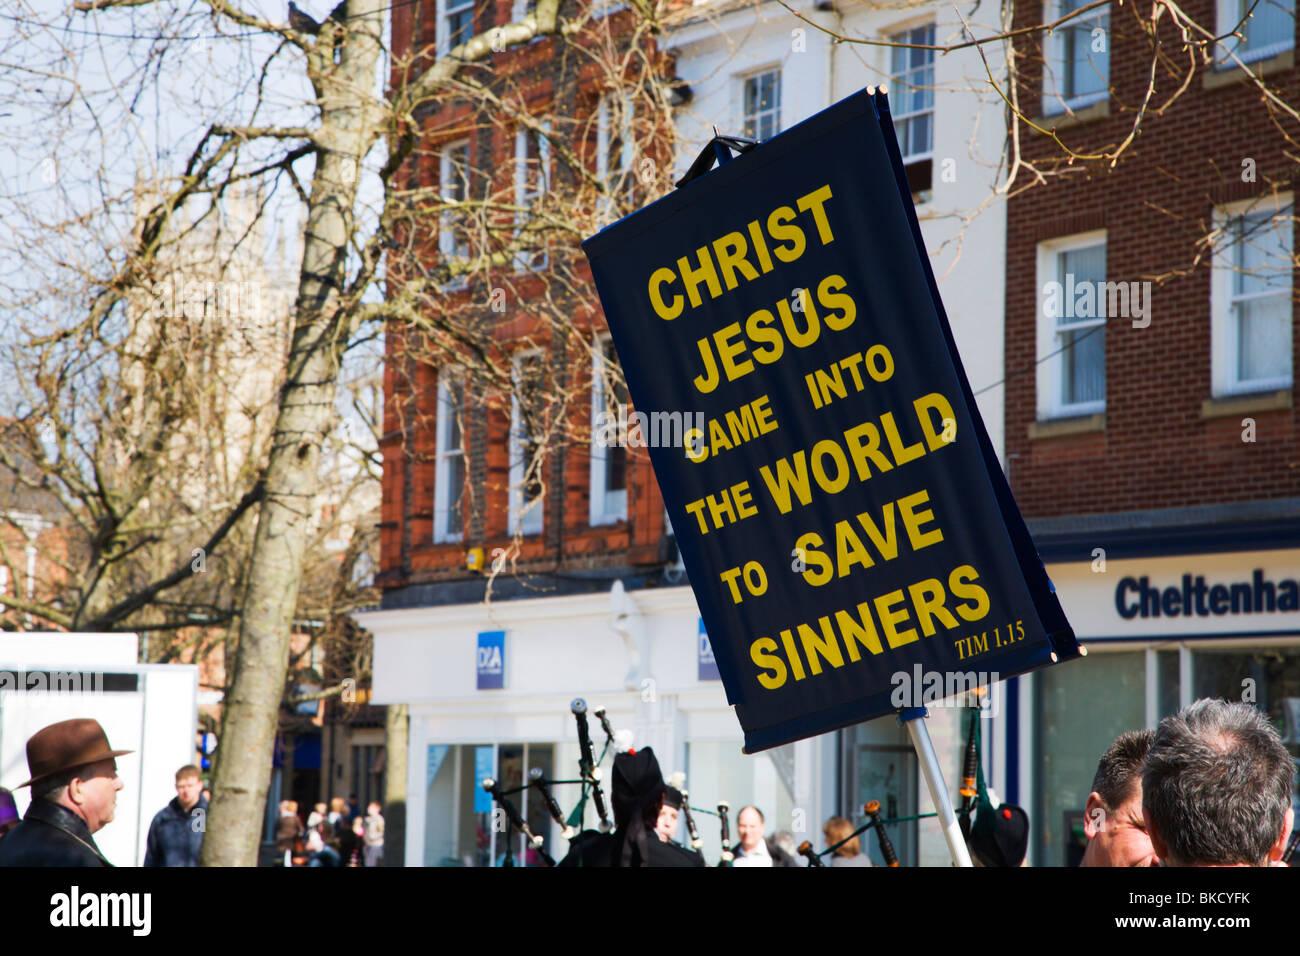 Christ Jesus Came Into The World To Save Sinners Placard York Yorkshire UK - Stock Image